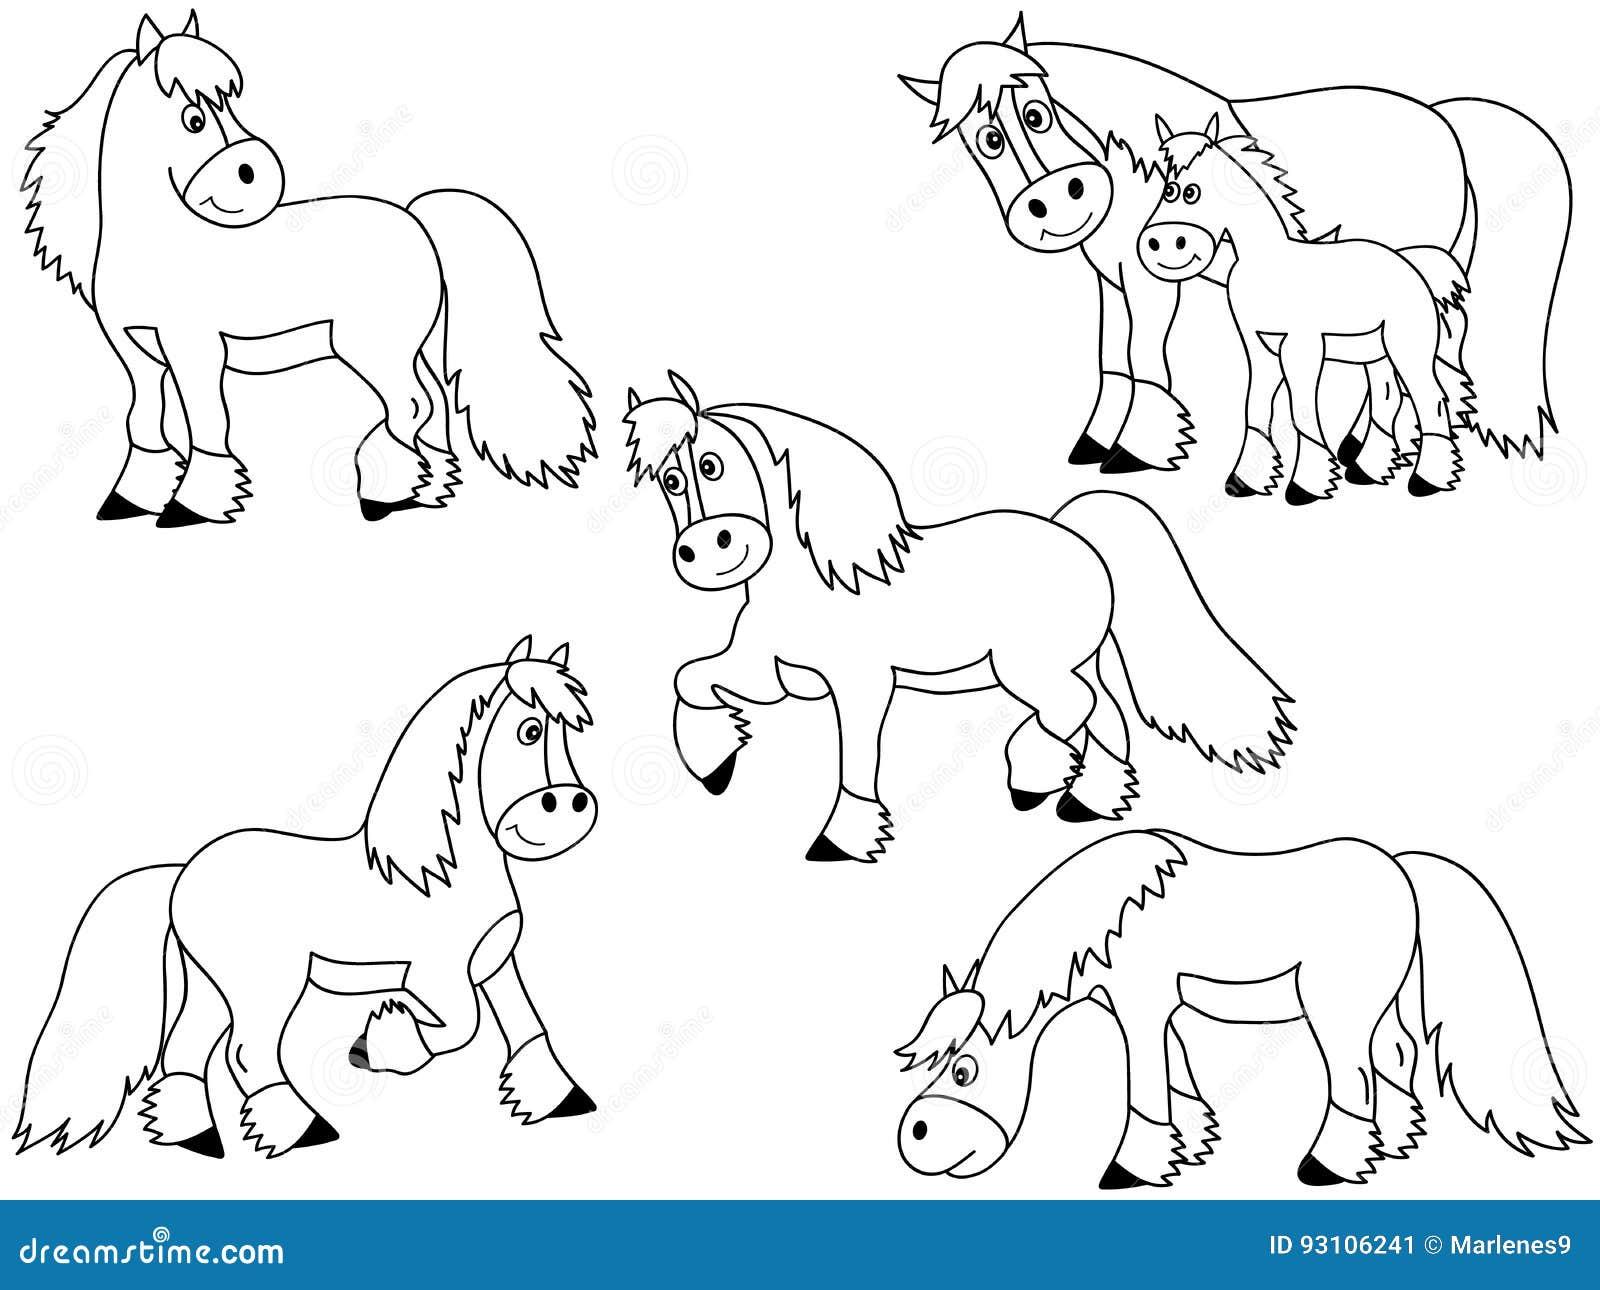 Horse Vector Set Stock Vector Illustration Of Eyes Clipart 93106241